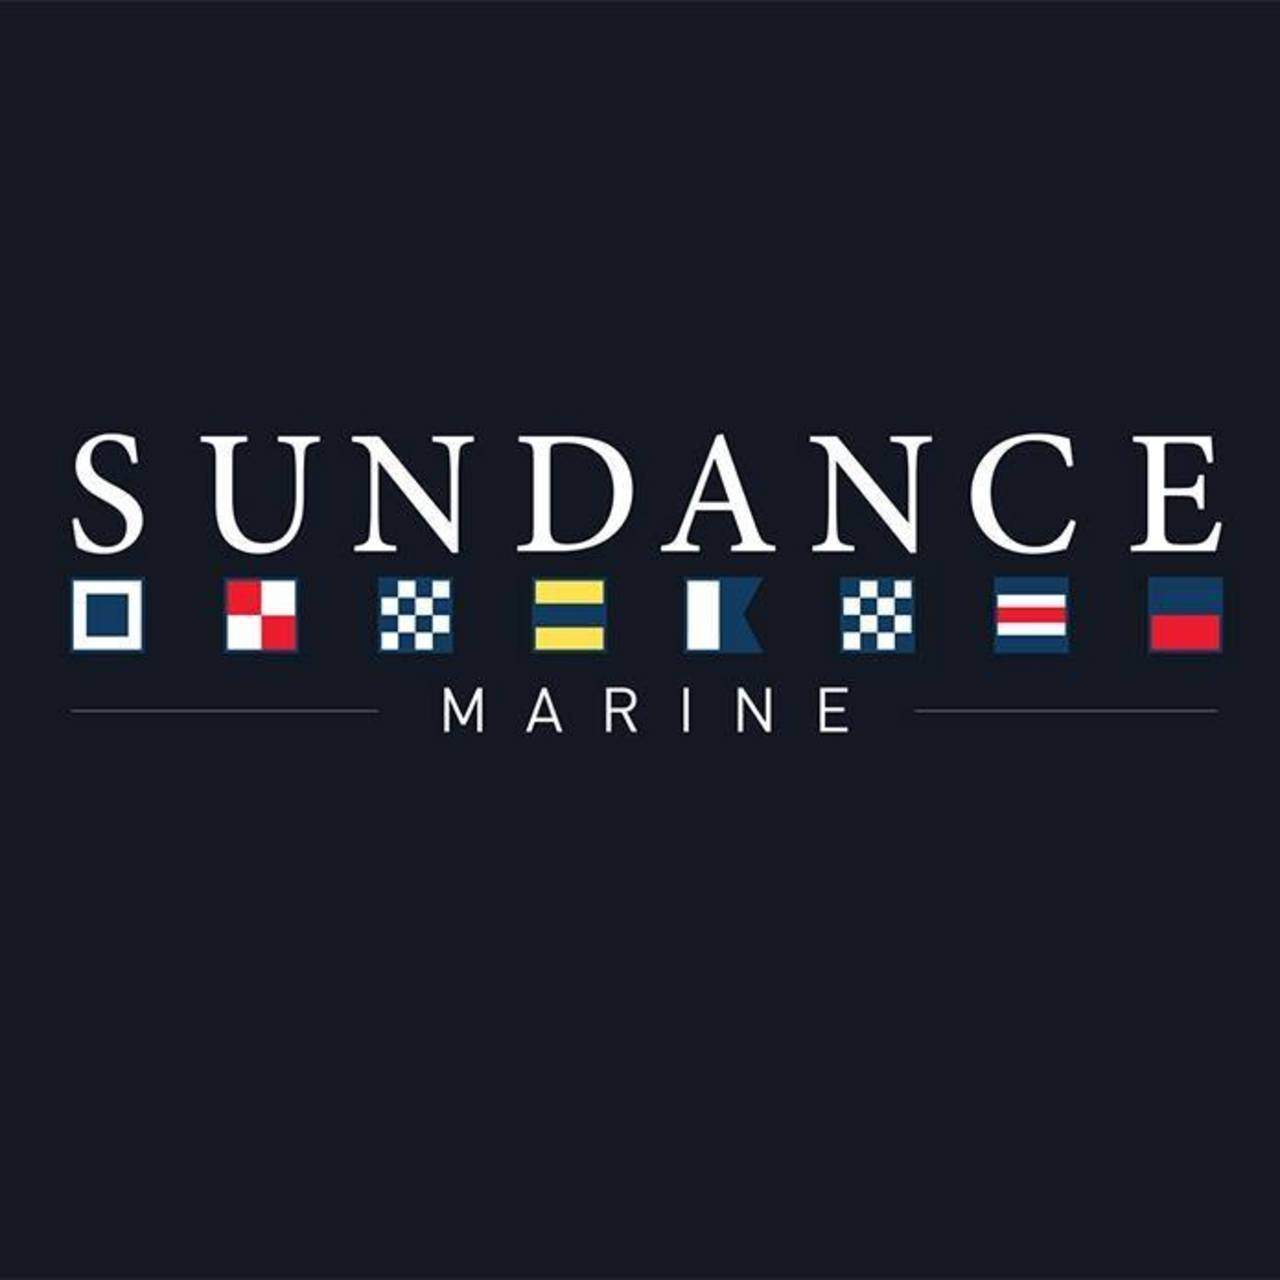 SUNDANCE MARINE HOBART OFFICE